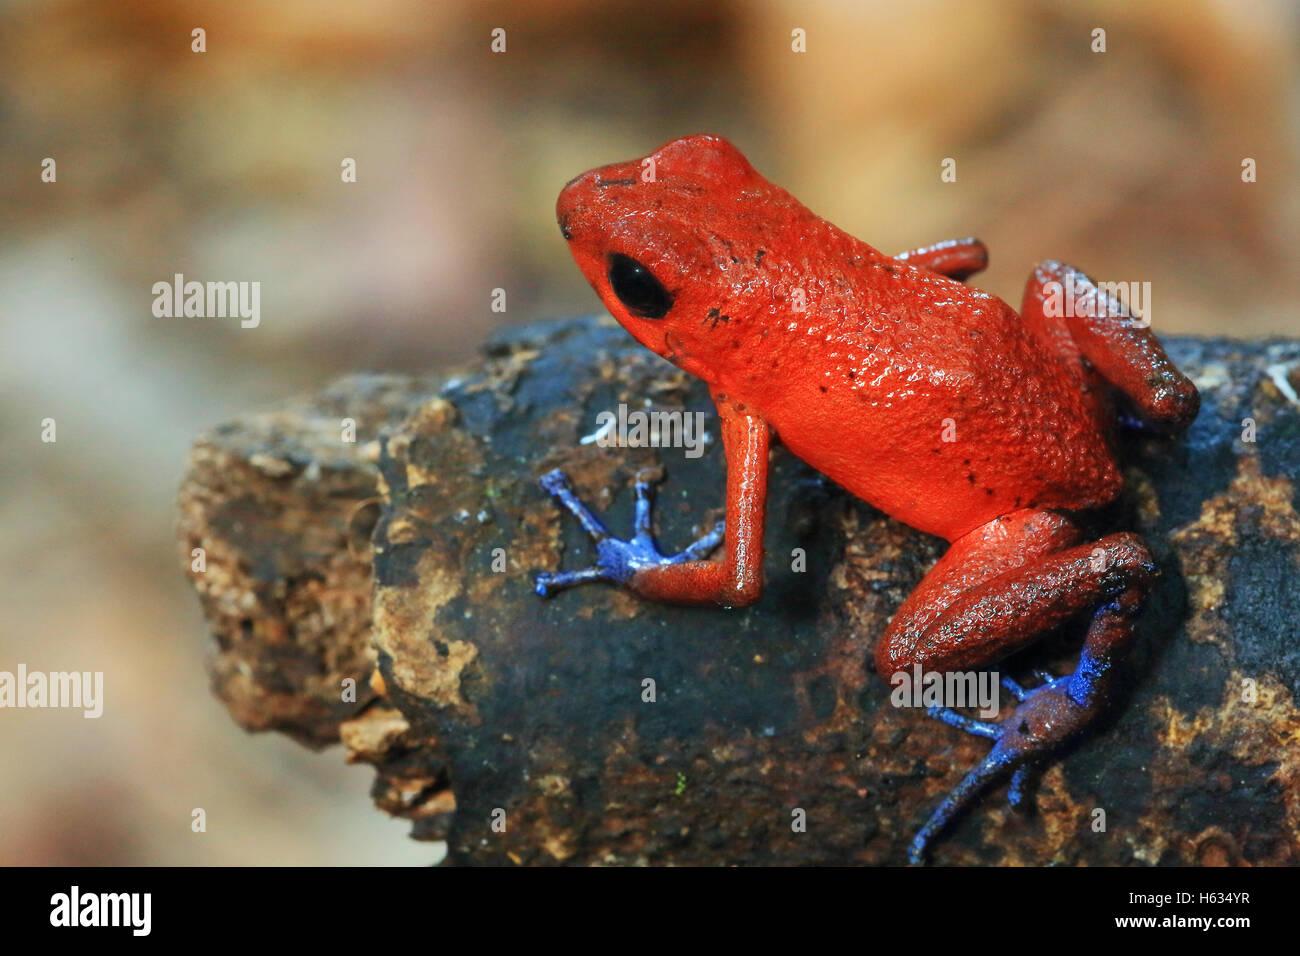 Blue jeans poison dart frog (Oophaga pumilio) in lowland rainforest. Cerro de Tortuguero, Costa Rica. - Stock Image